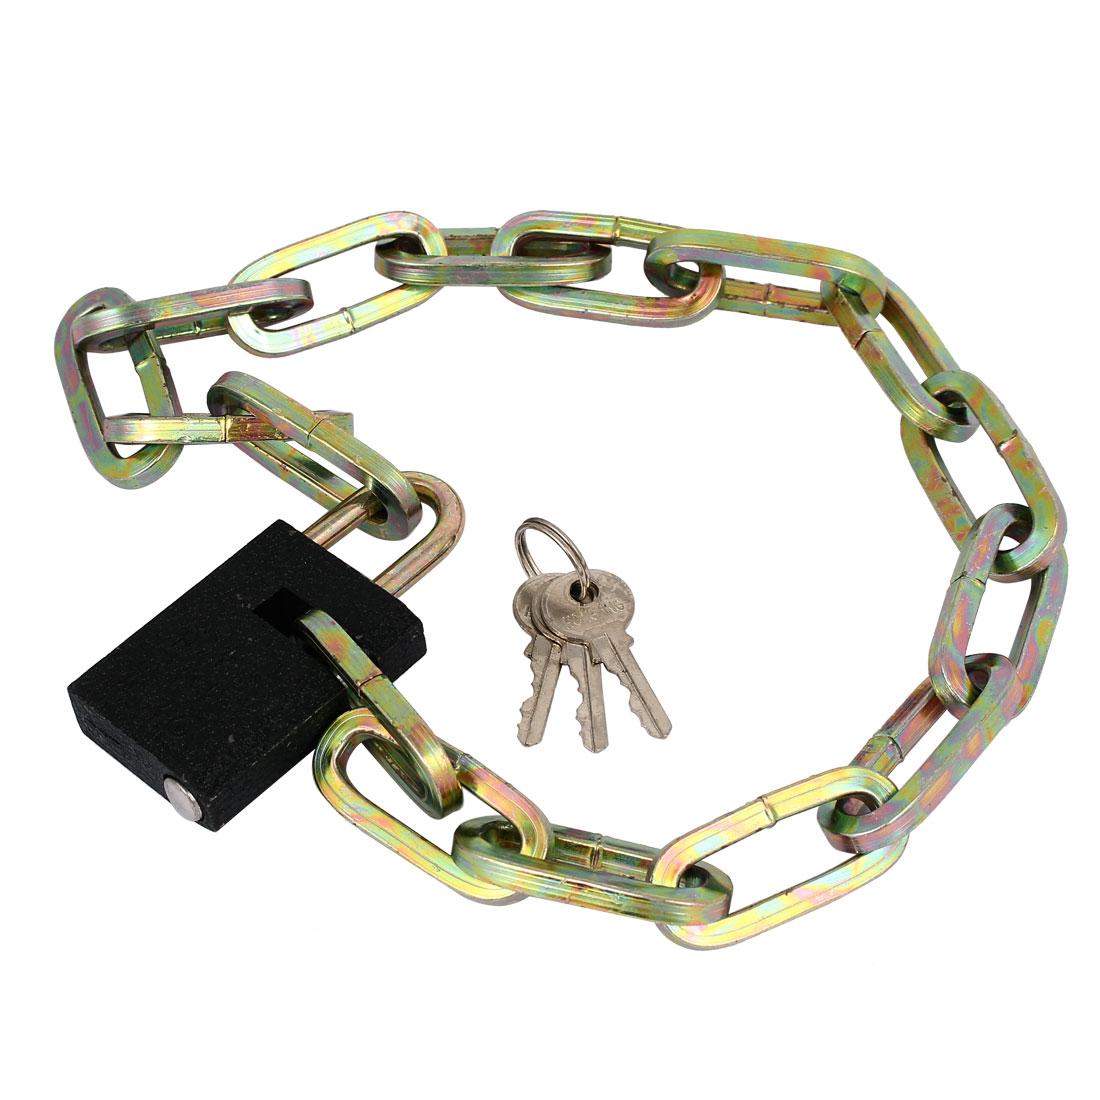 Cycling Bike Bicycle Security Chain Lock Padlock 70cm Length w Keys